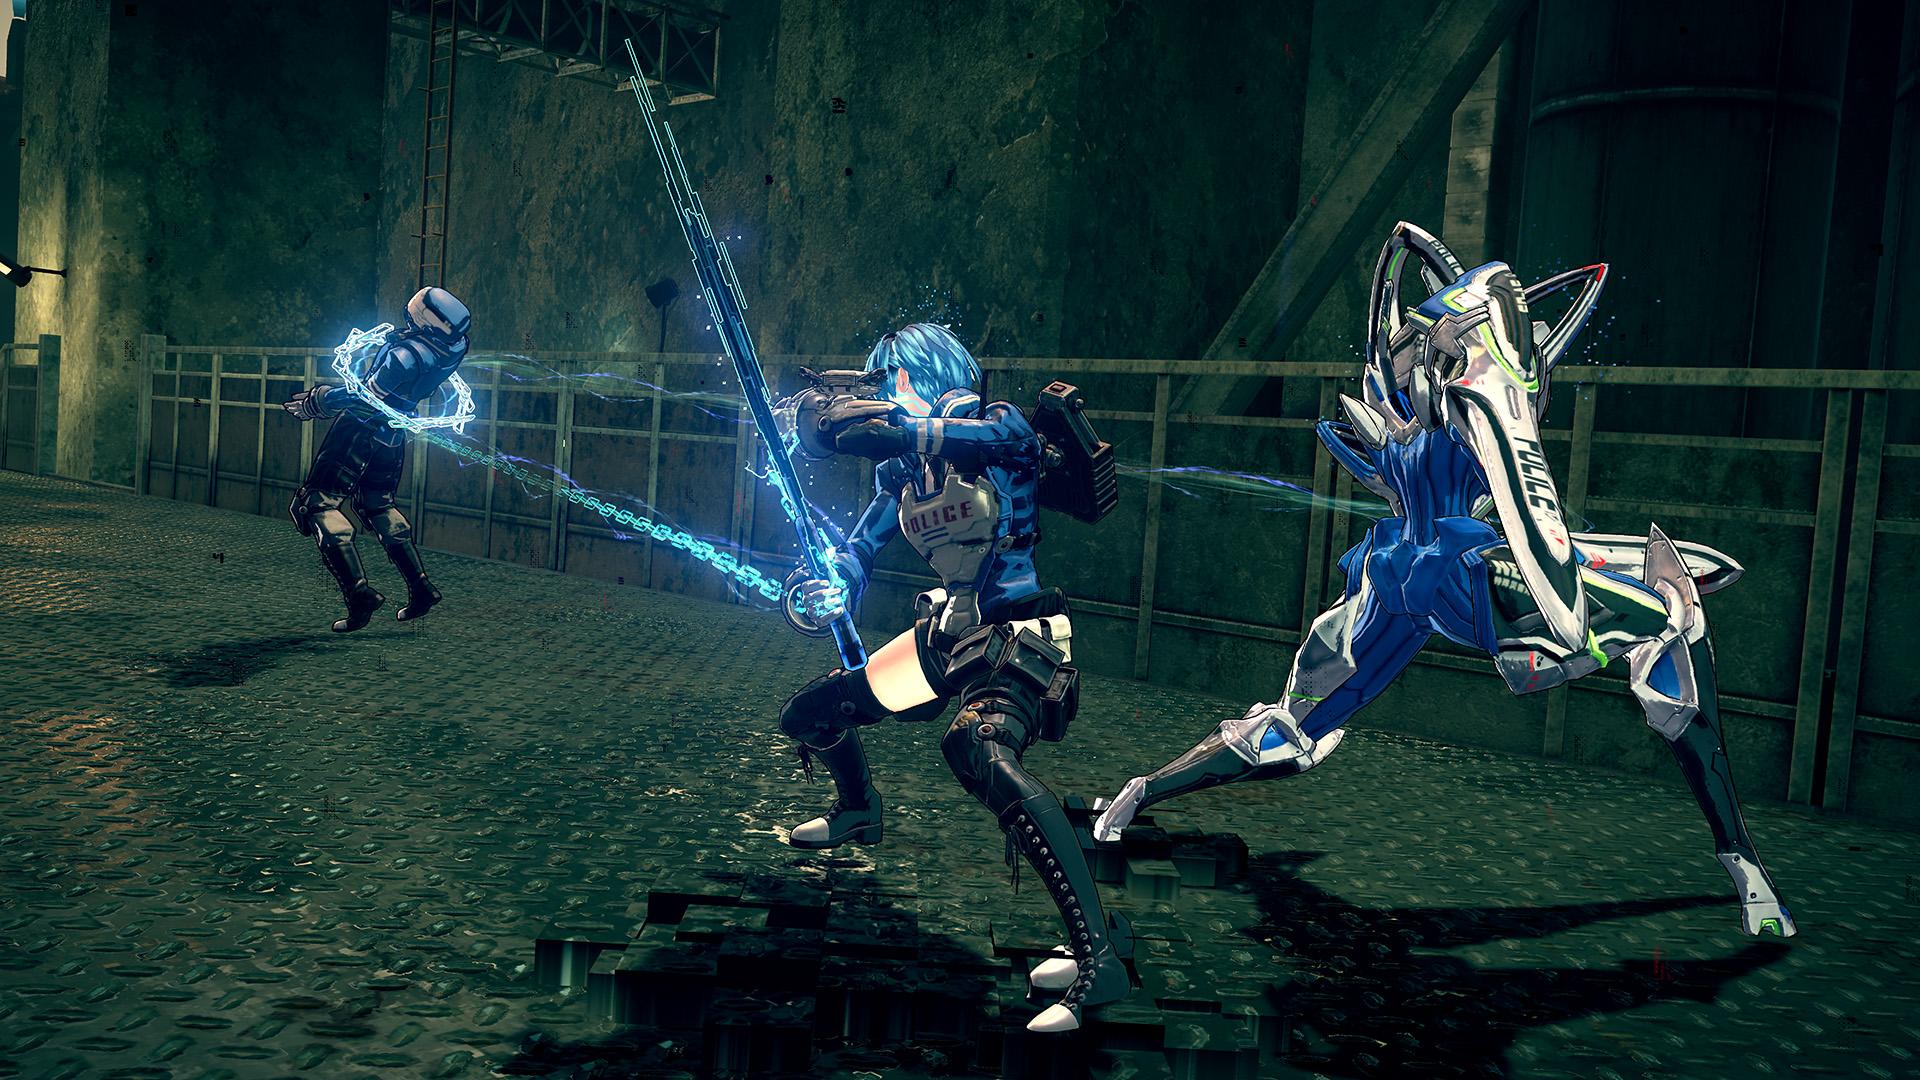 В Astral Chain будет поддержка кооператива для двух игроков